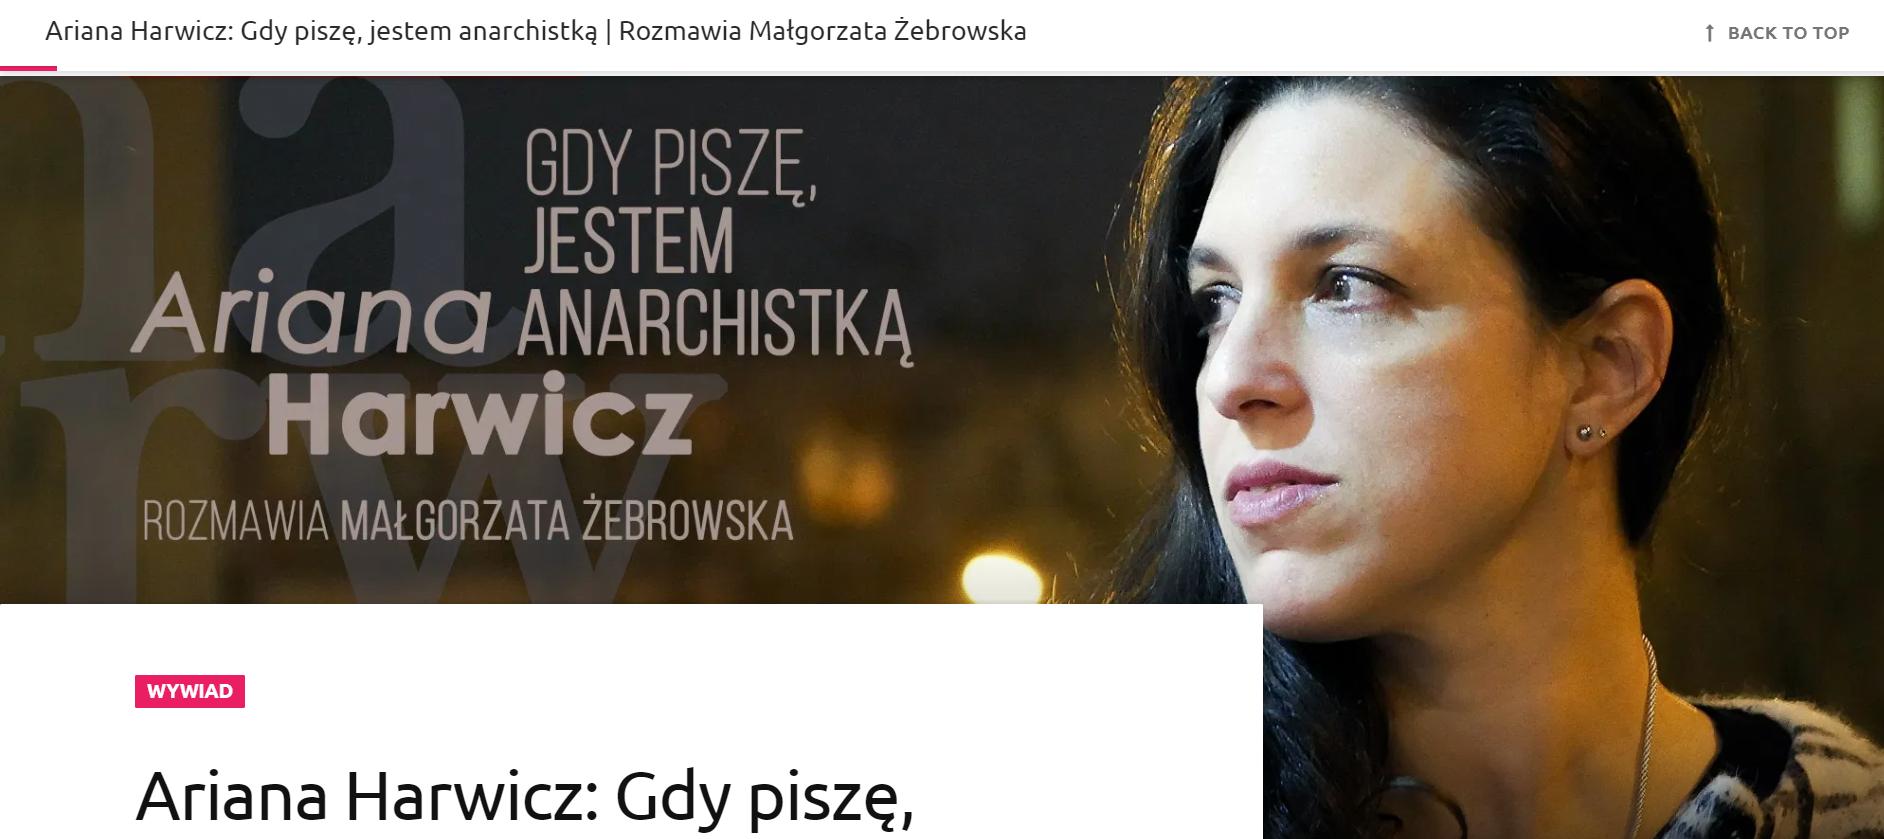 Zrzut ekranu 142